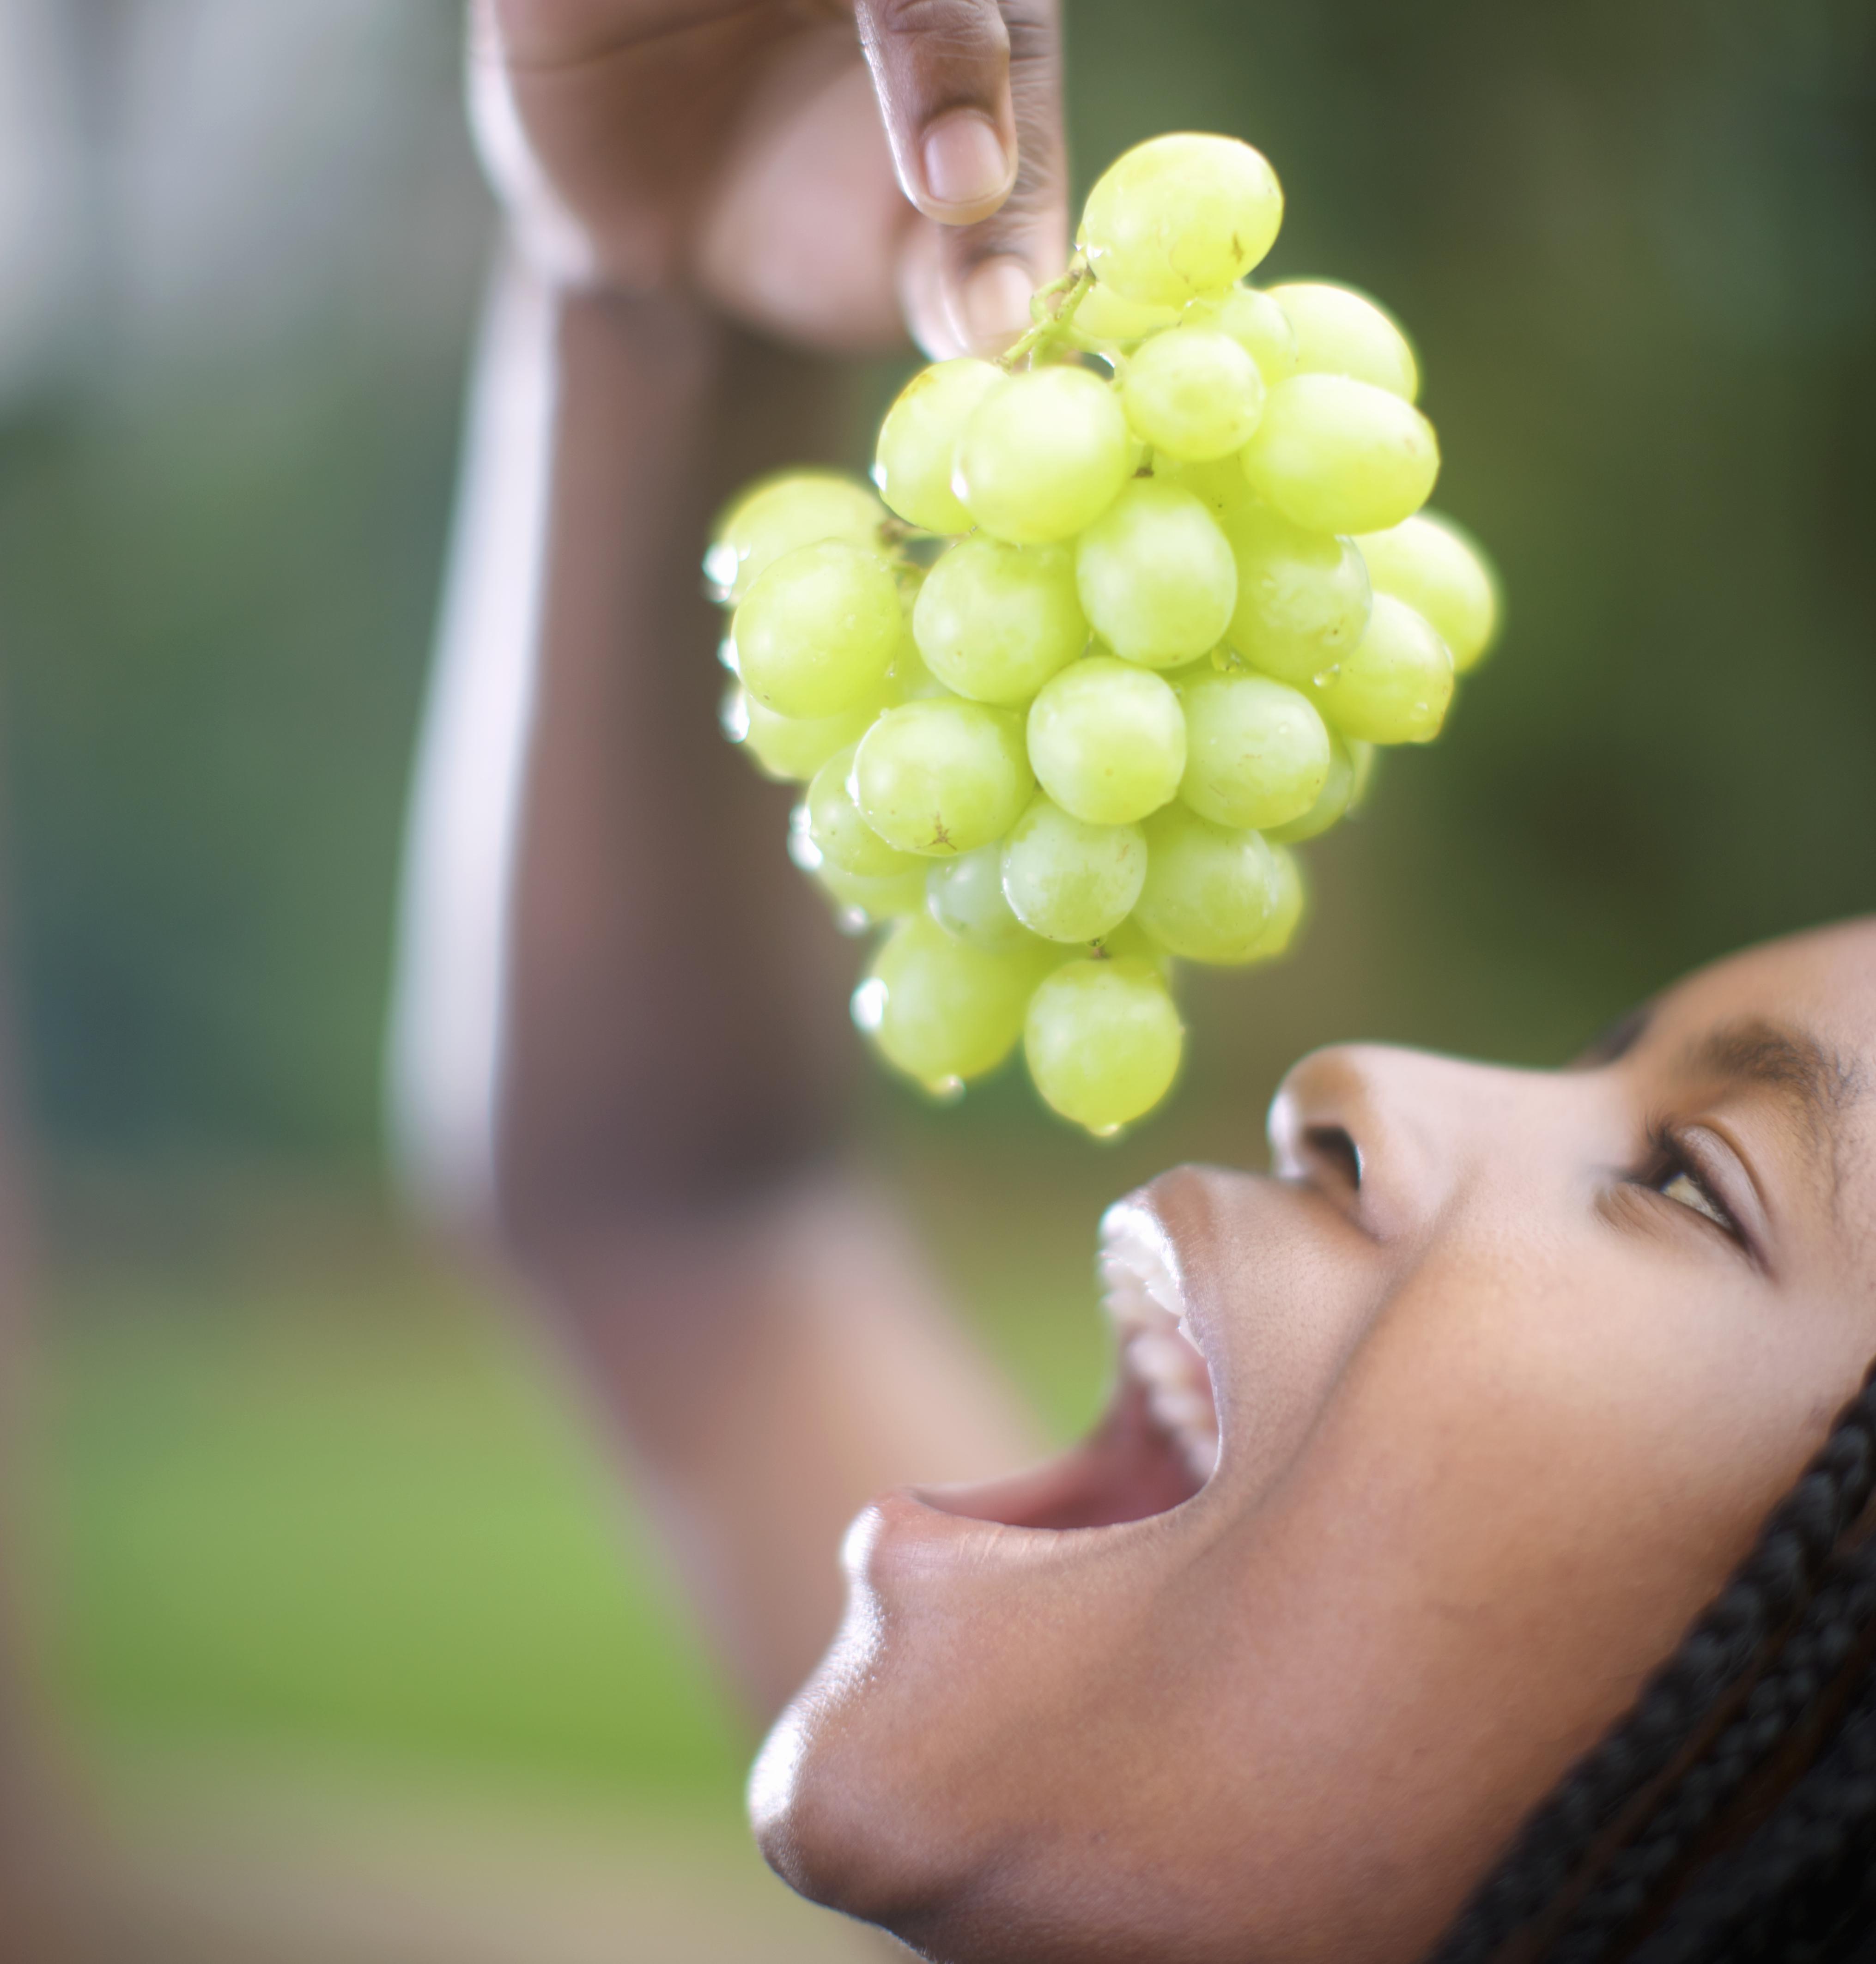 Woman eating grapes, Pietermaritzburg, KwaZulu-Natal Province, South Africa